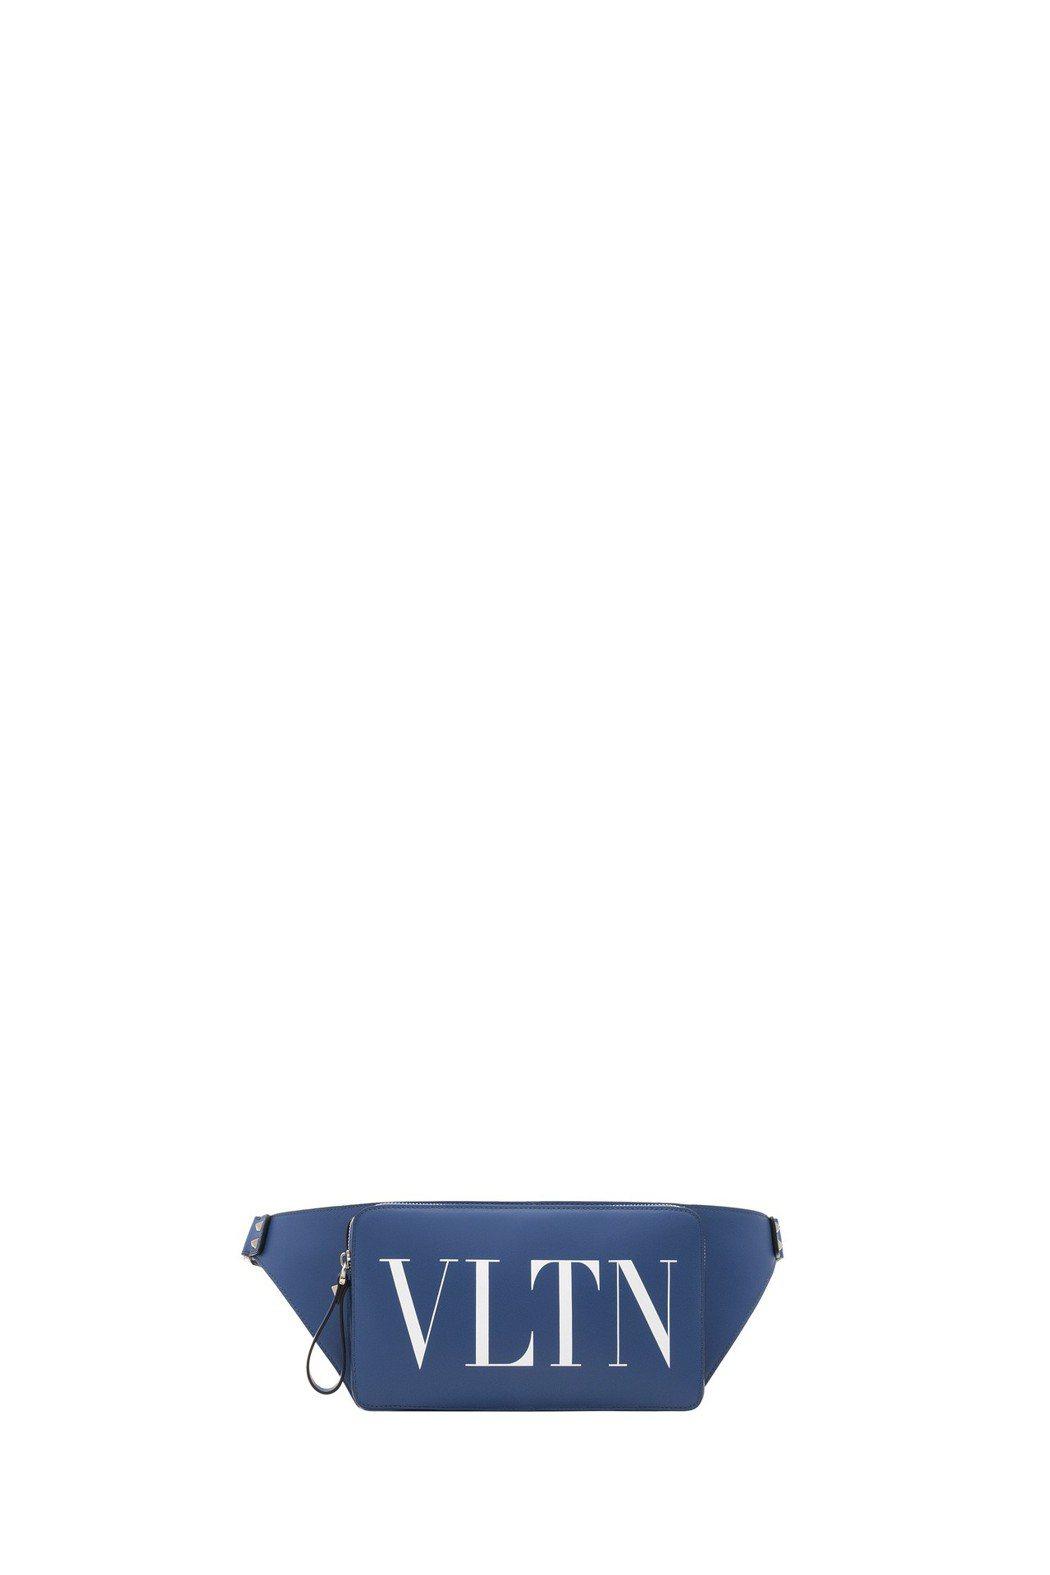 Valentino Garavani VLTN logo 小牛皮腰包,30,20...